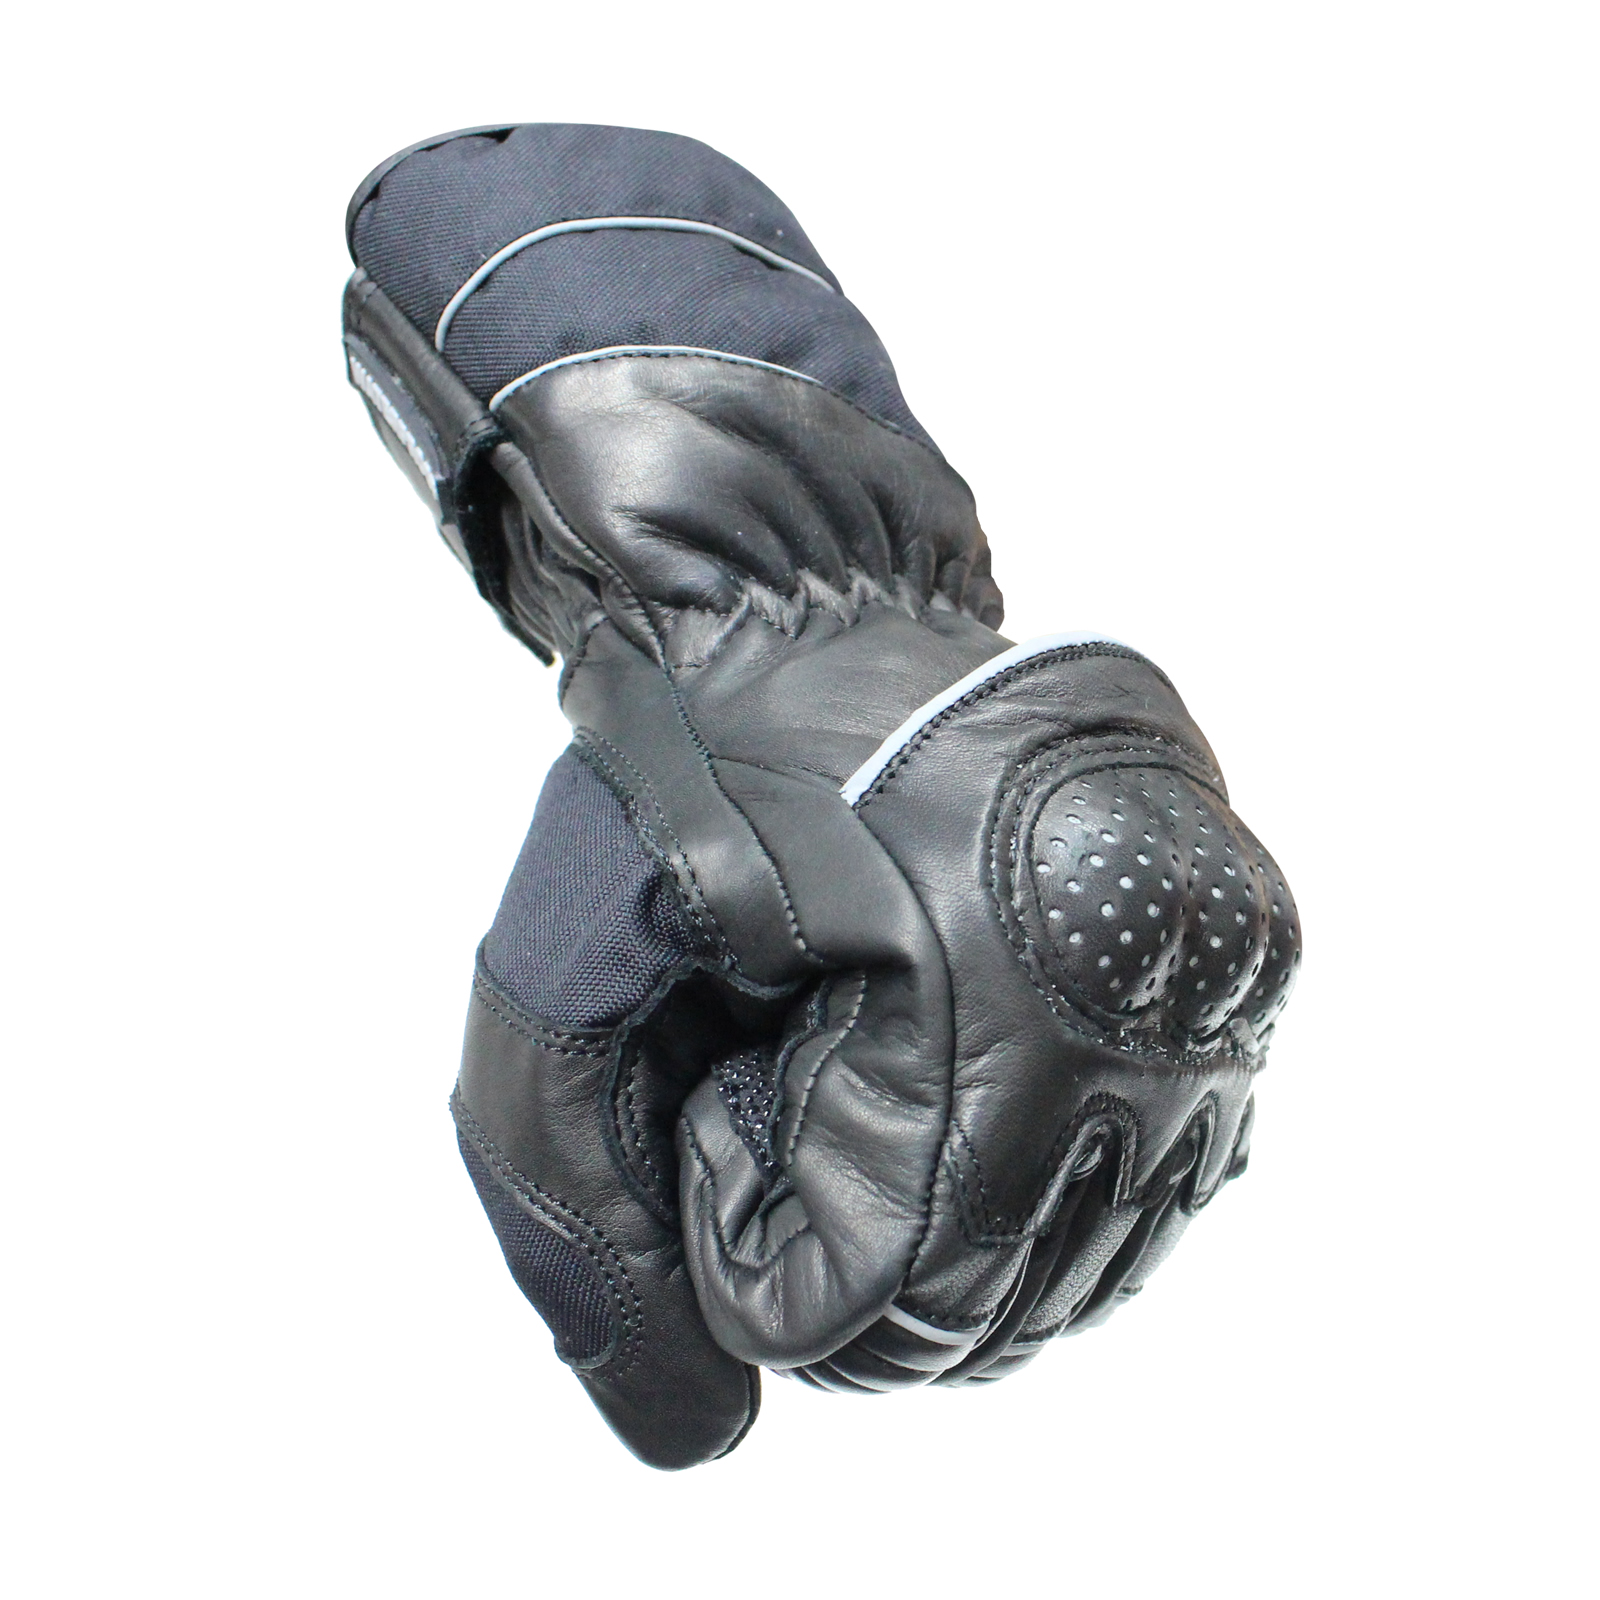 Motorcycle gloves all season - Black Vector Leather Motorcycle Motorbike Waterproof All Season